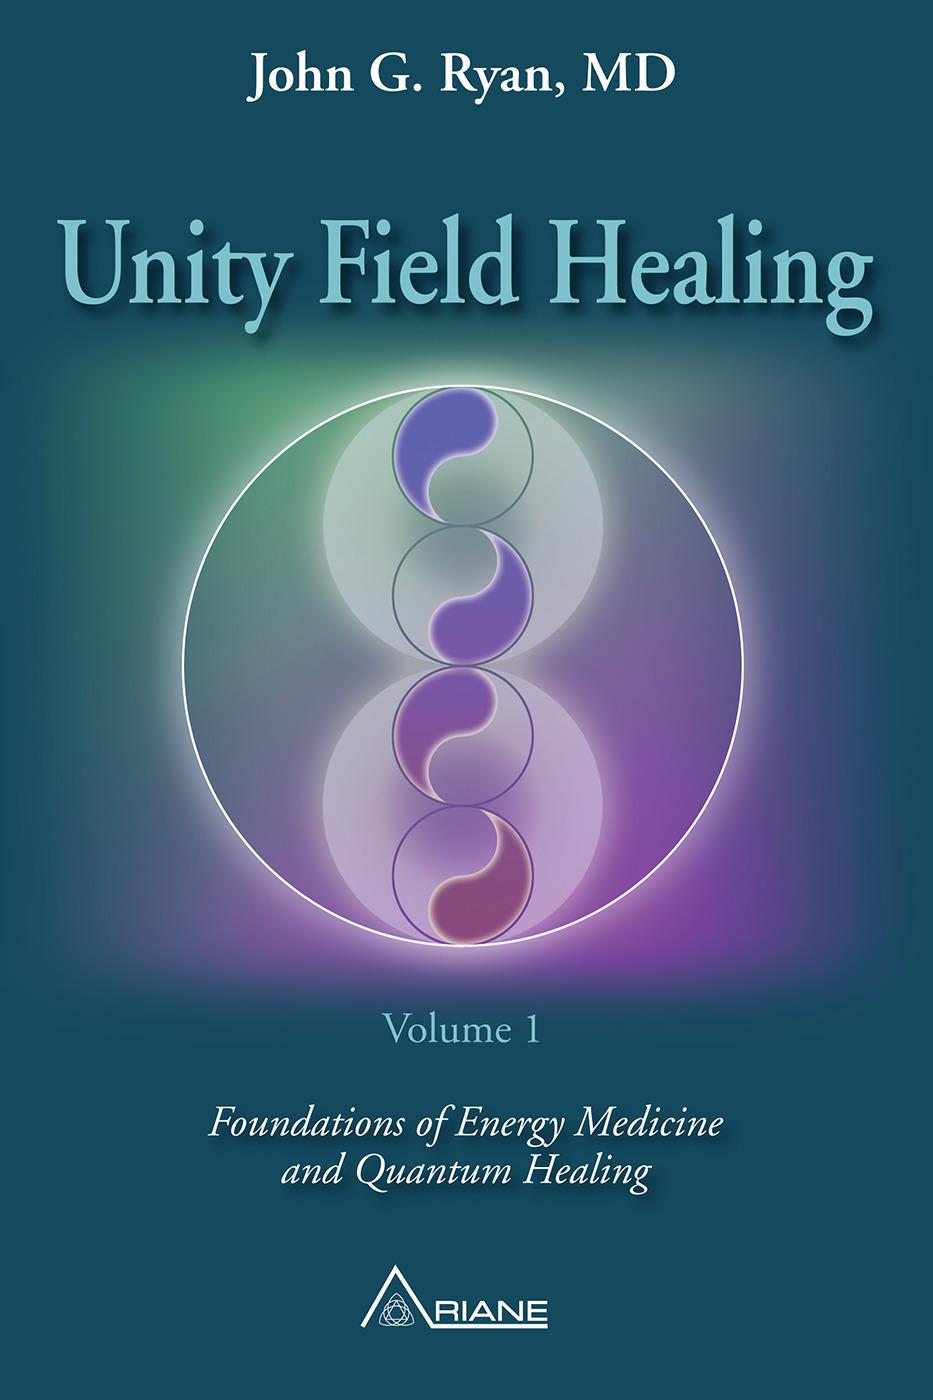 Unity Field Healing - Volume 1